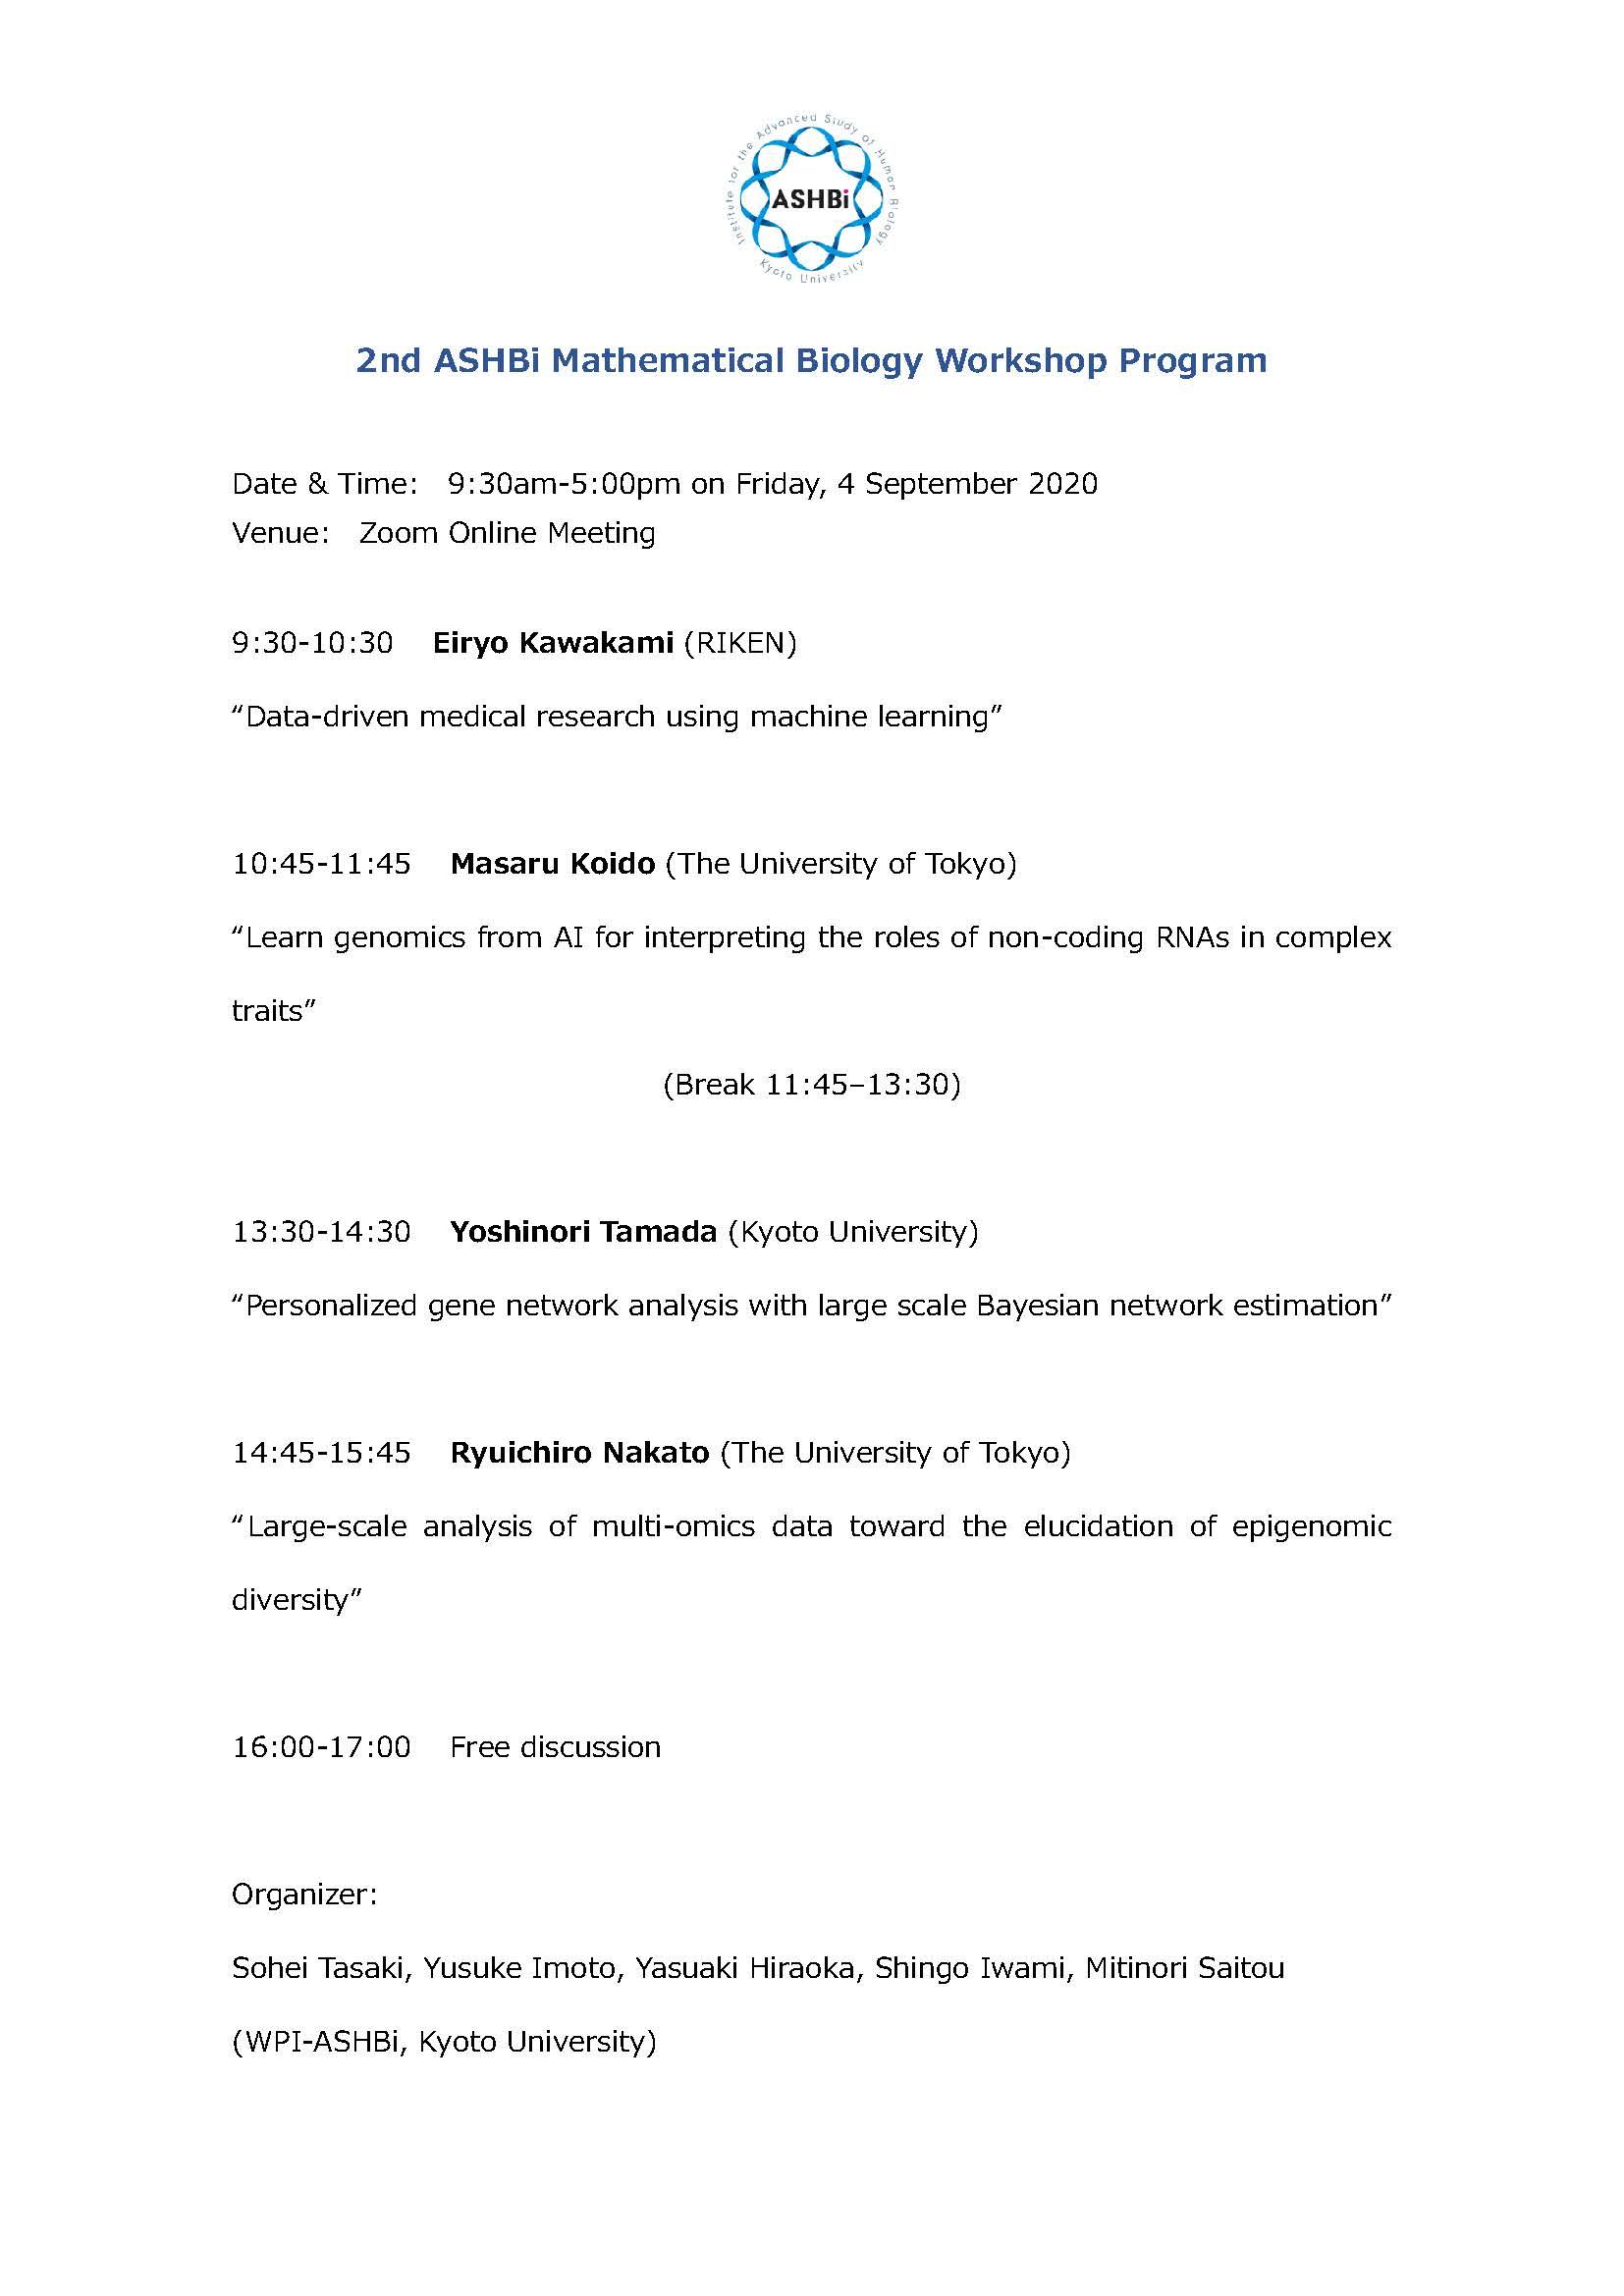 Program of 2nd ASHBi Mathematical Biology Workshop